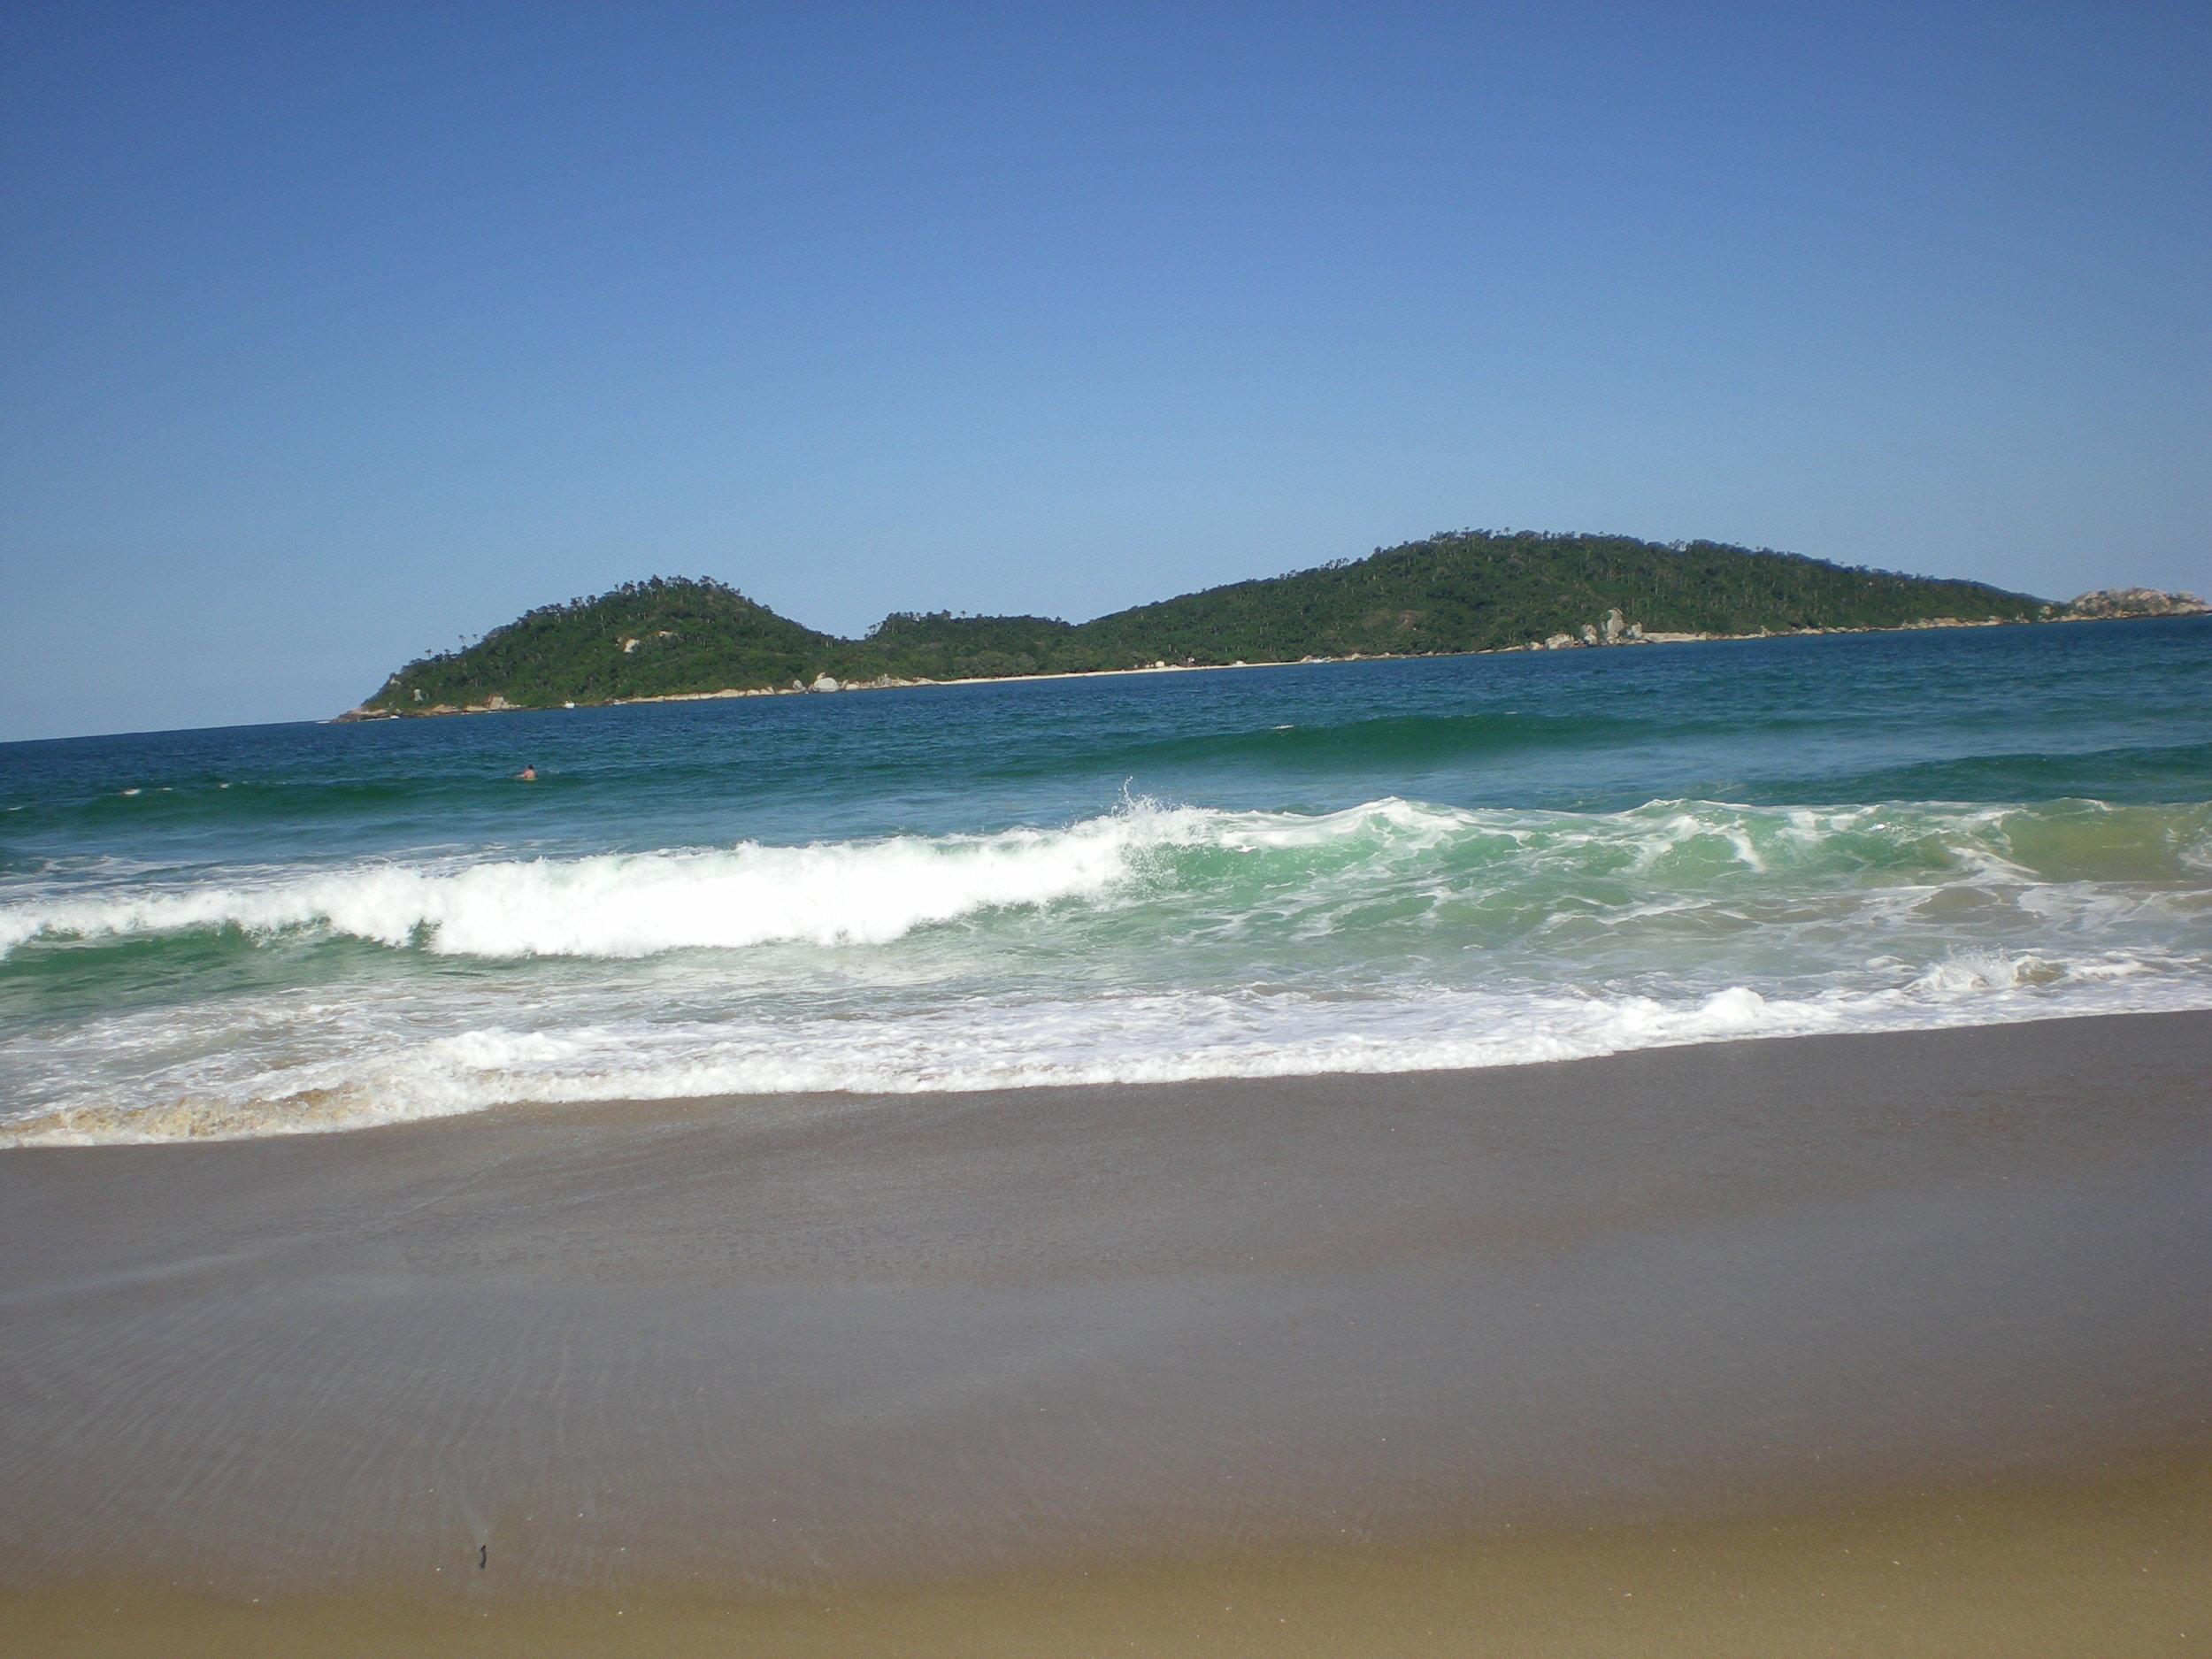 Beach in Florianopolis Brazil